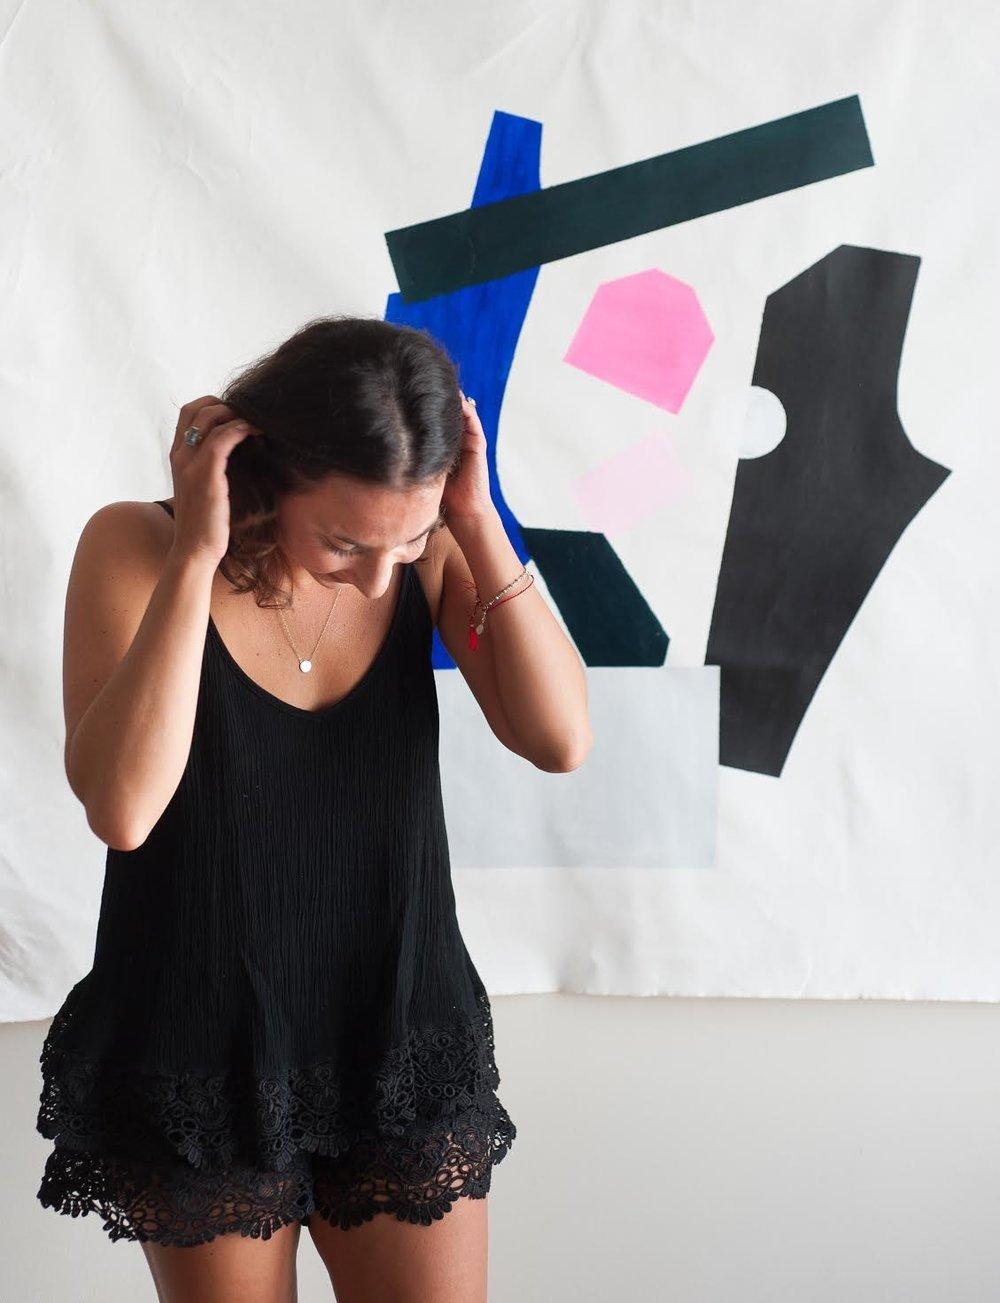 Kristin Gaudio